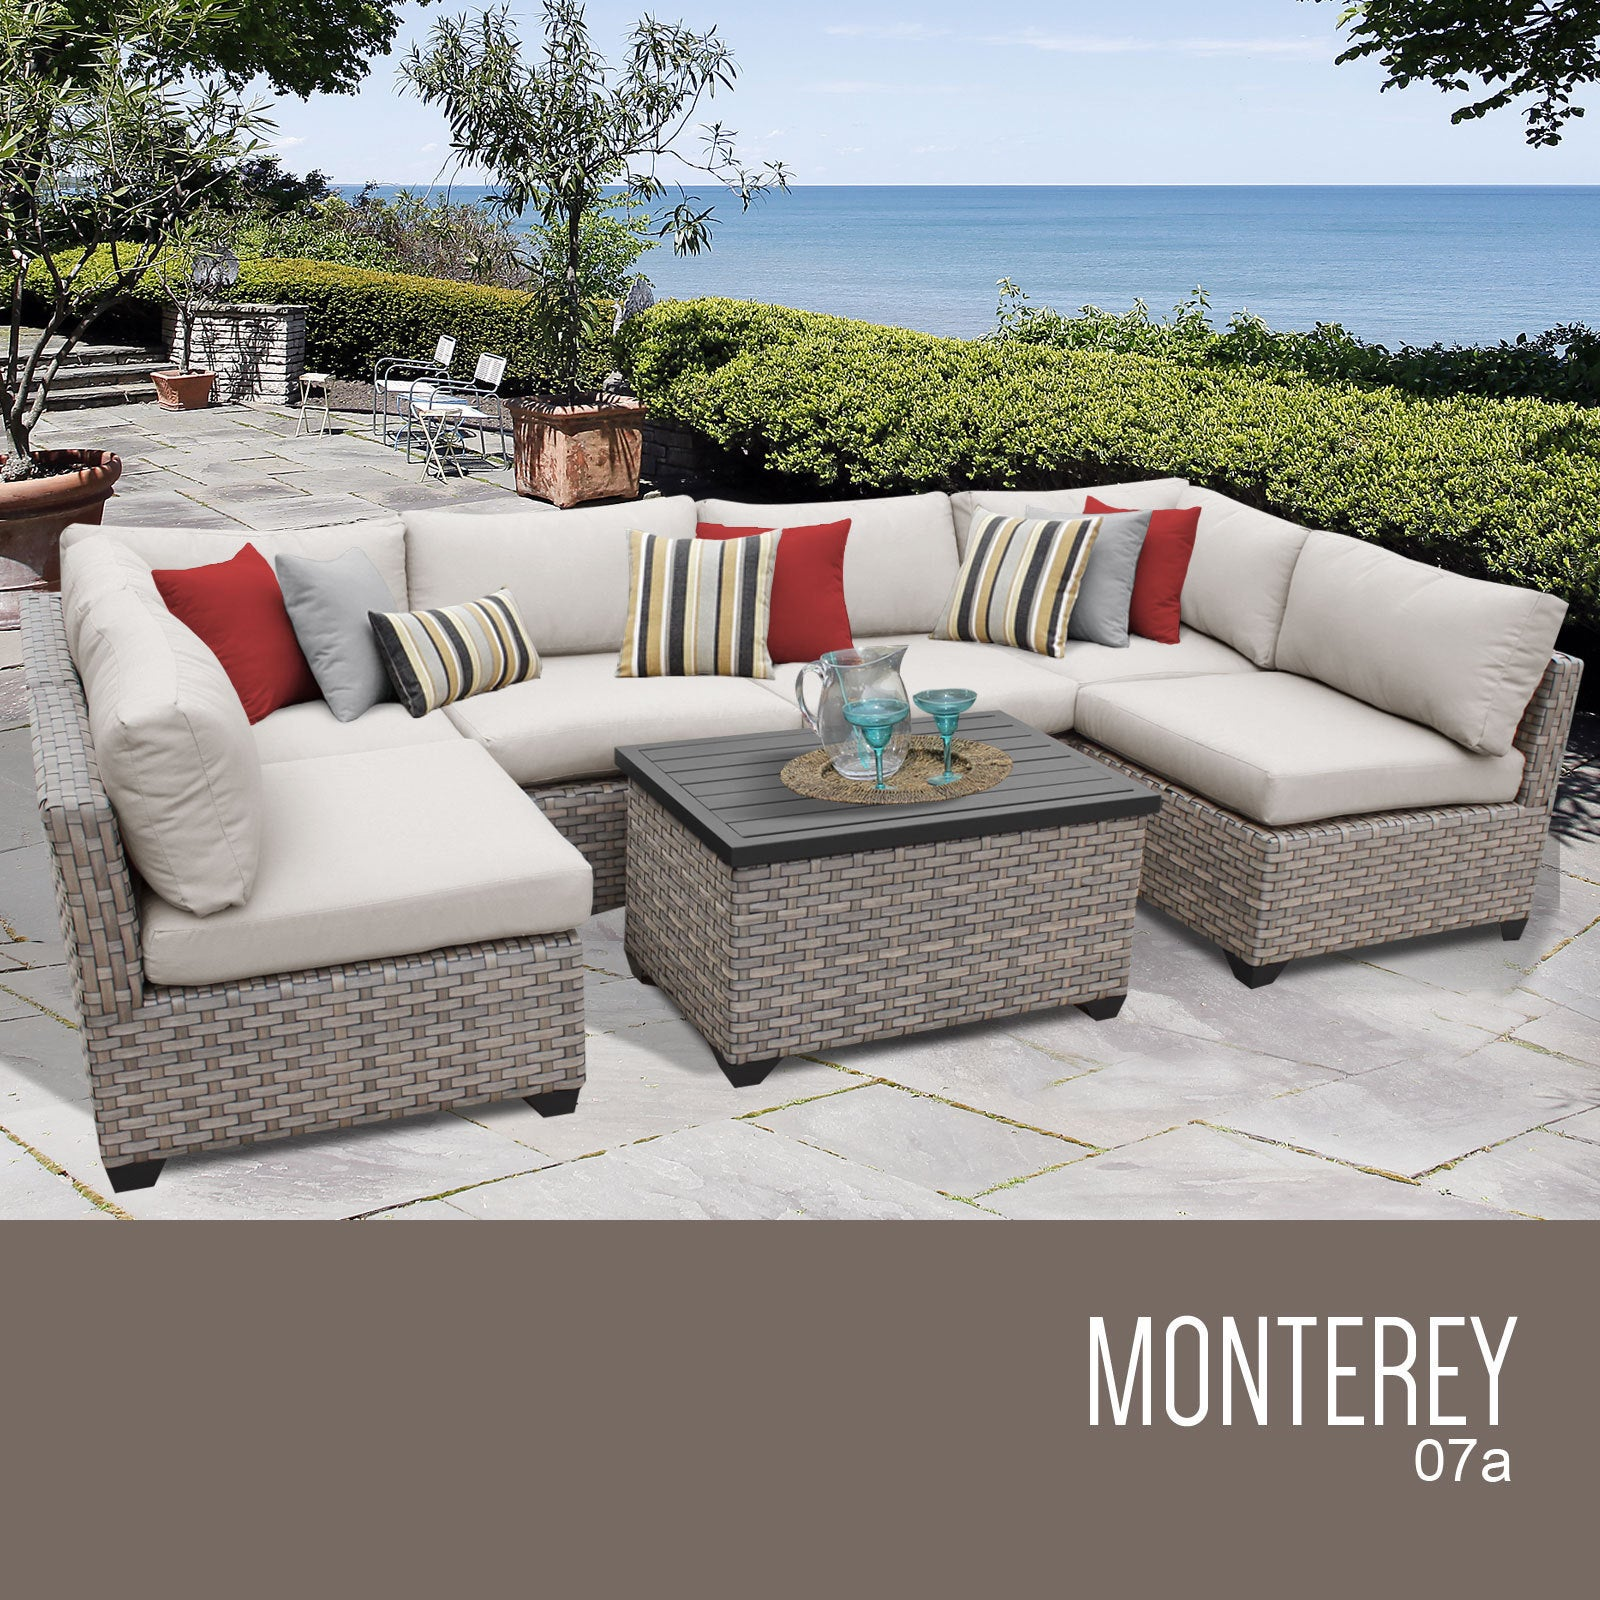 outdoor furniture wicker black sofa com set choice garden products patio amazon rattan sectional dp best